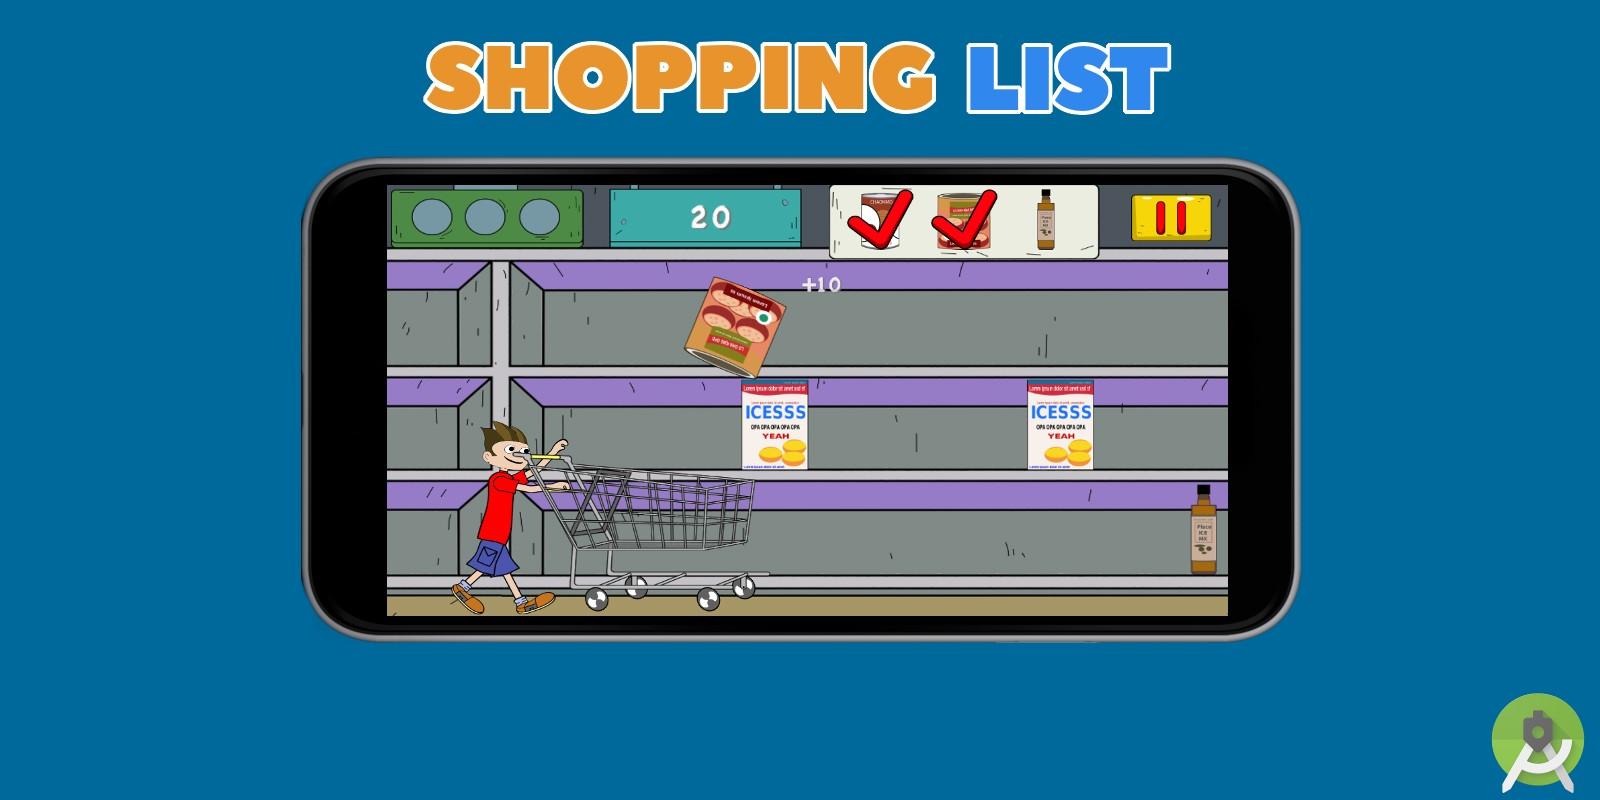 Shopping List - AdMob - Android Studio